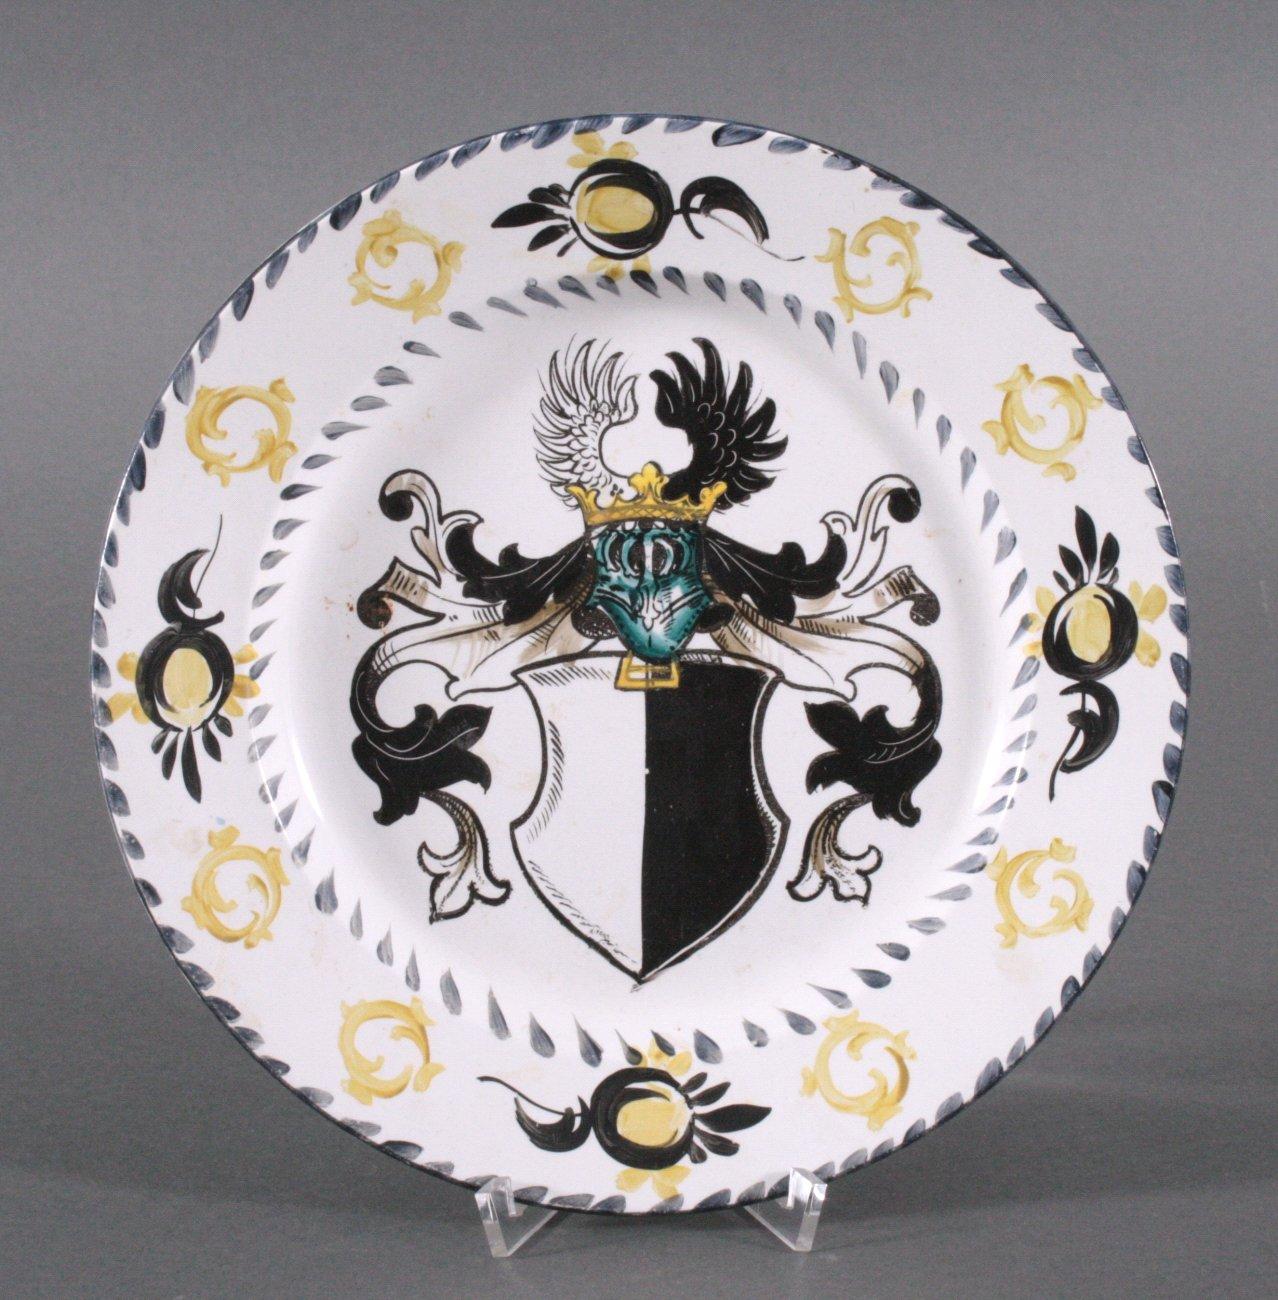 Handbemalter Wappenteller